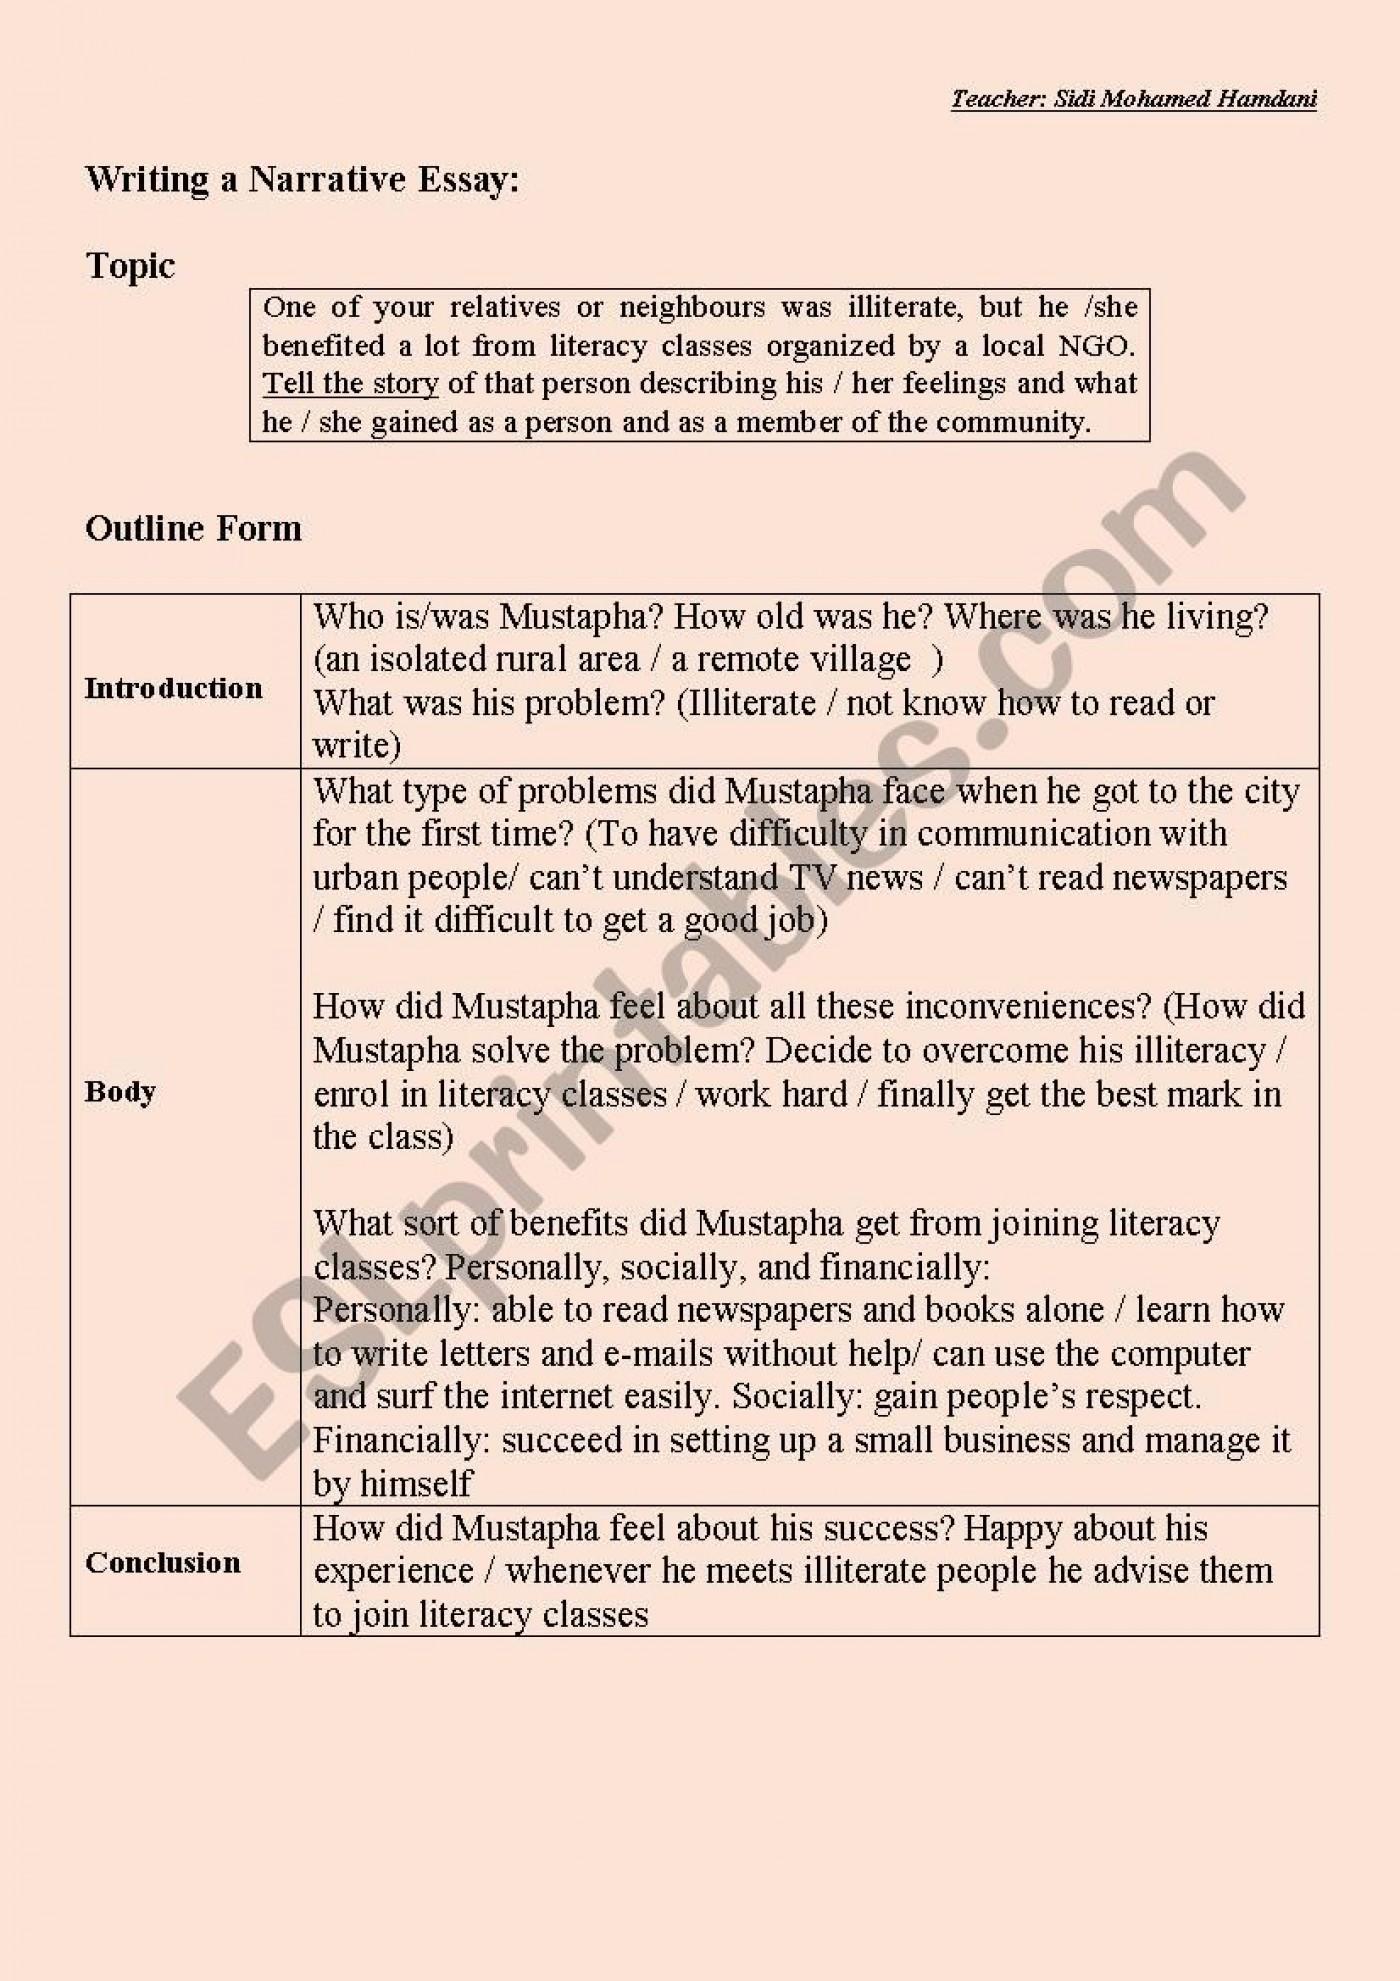 009 Sample Short Essay Family Essays English My Example